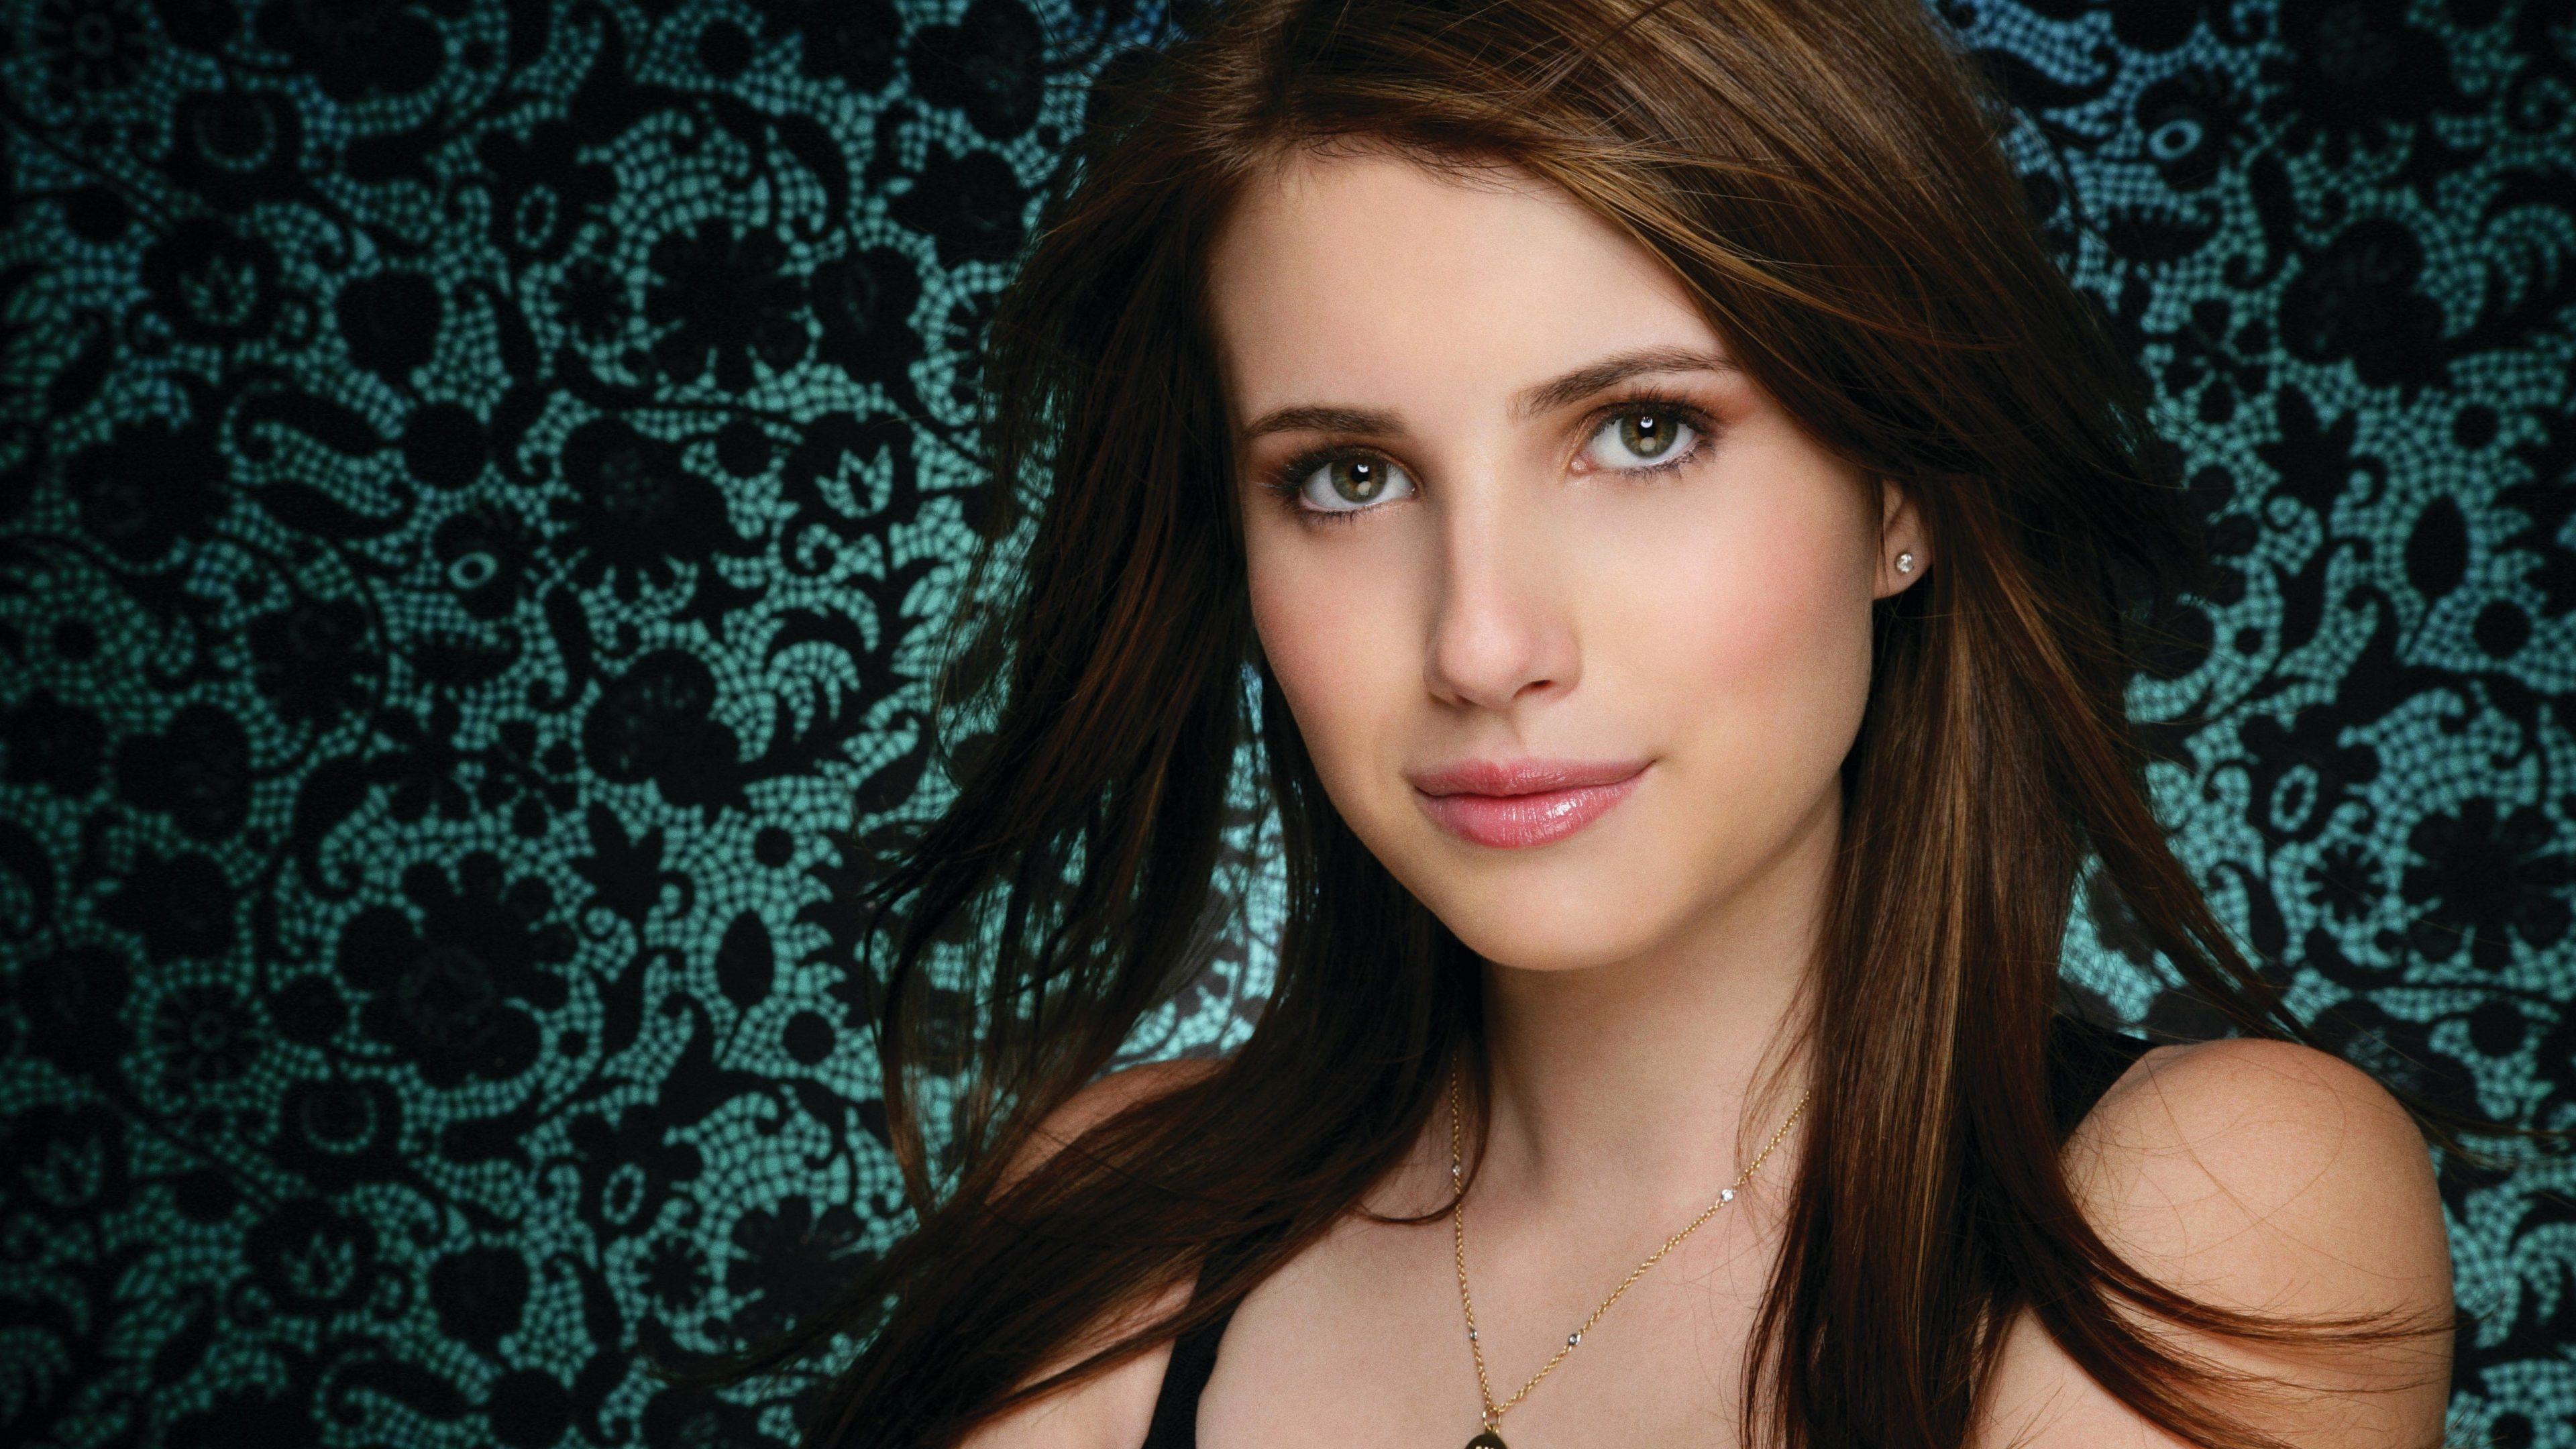 3840x2160 Emma Roberts 4k Hd Wallpaper Image